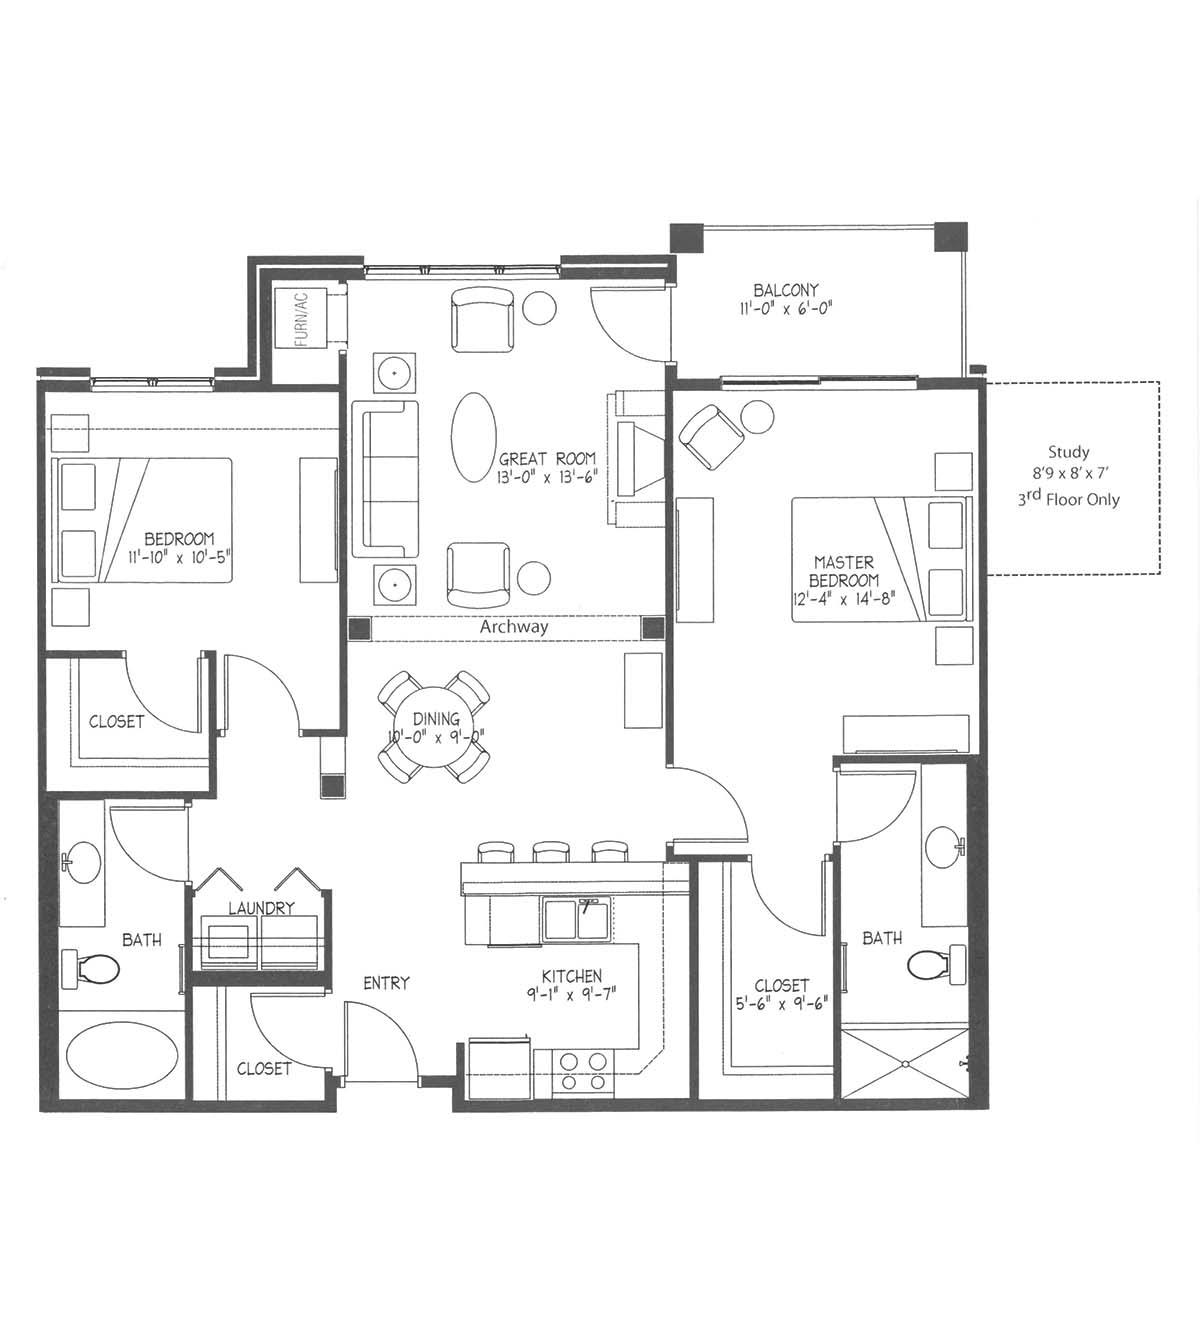 Lenox lenox aquila commons for The lenox floor plan